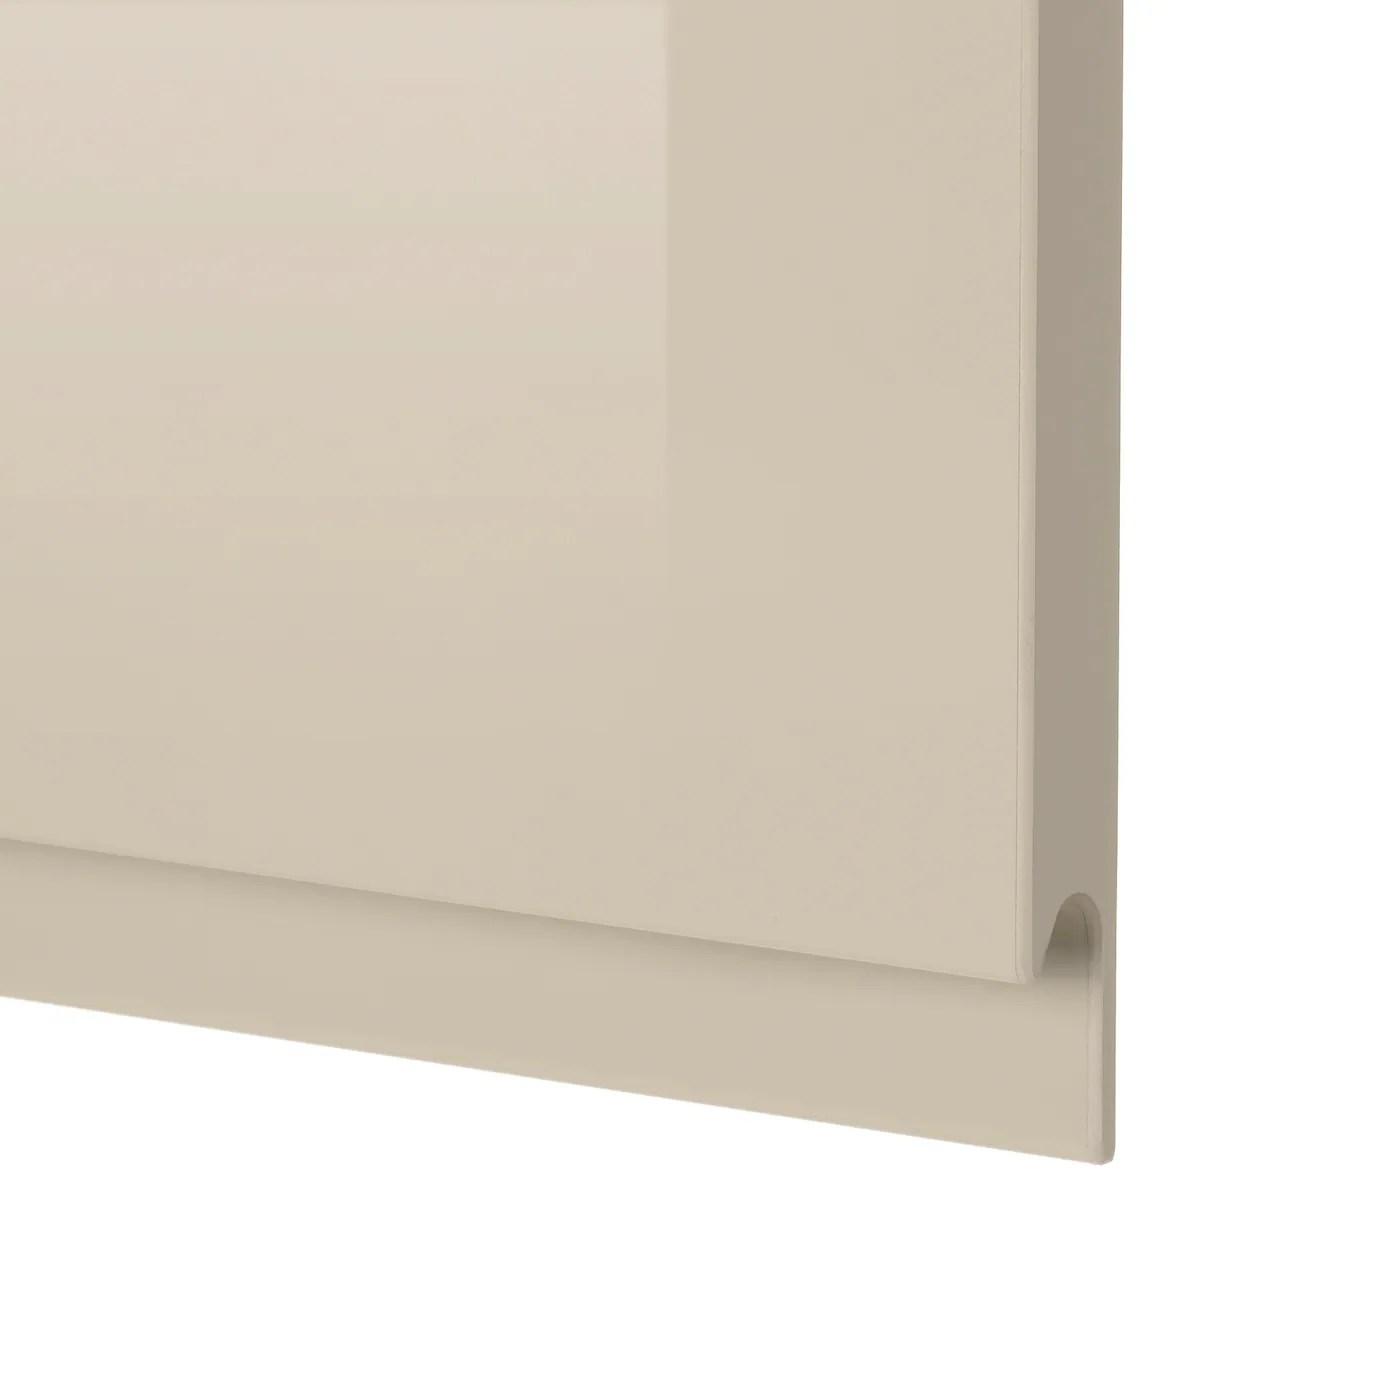 Metod Wandschrank Horizontal - Weiß